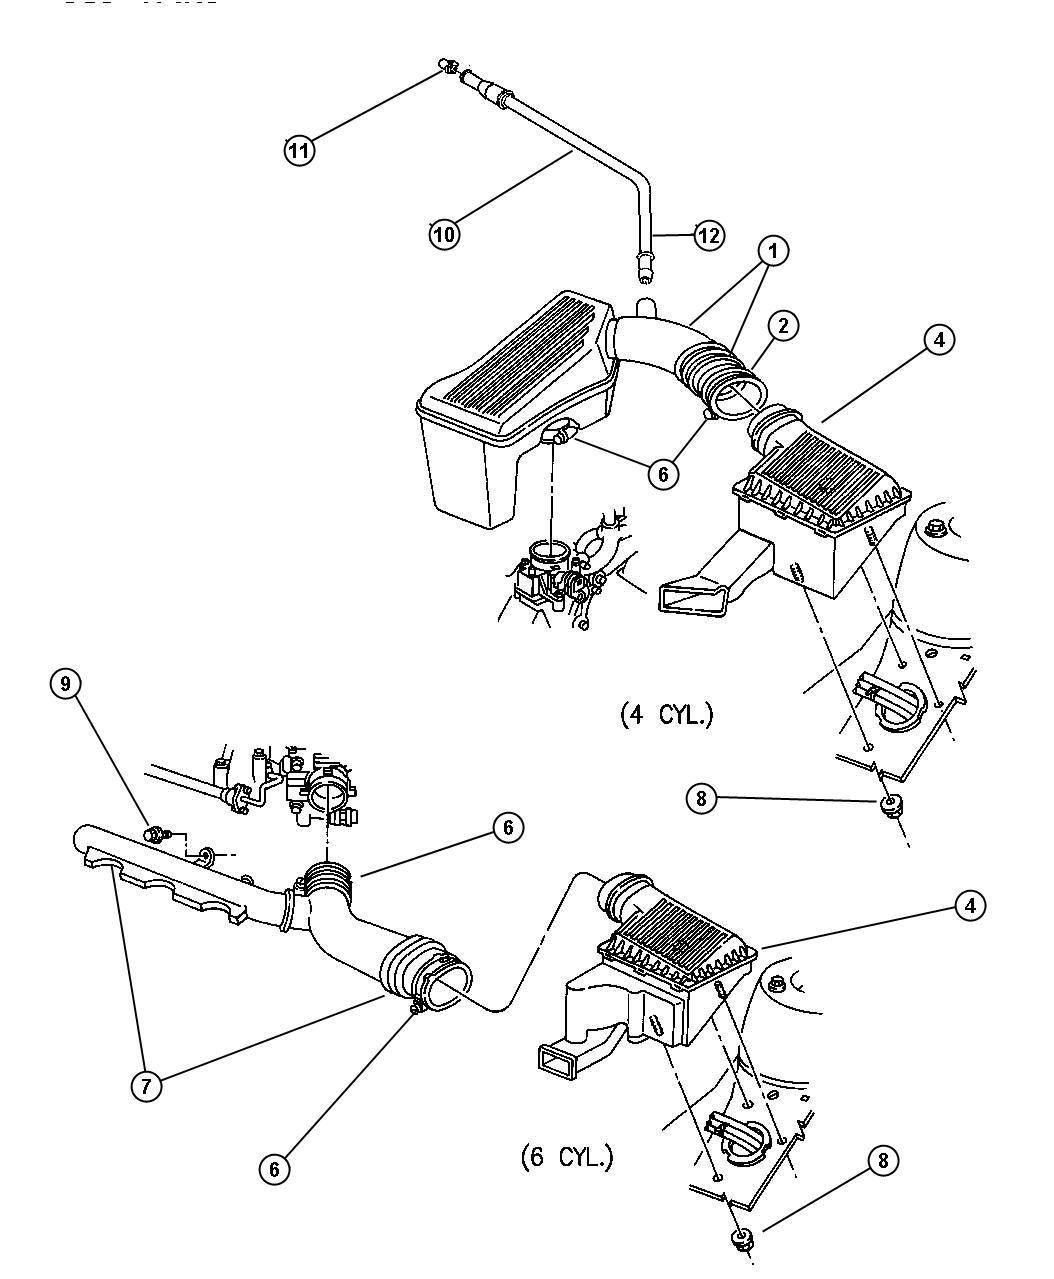 Chrysler Cirrus Element. Air cleaner. Engine, filter, fca ...